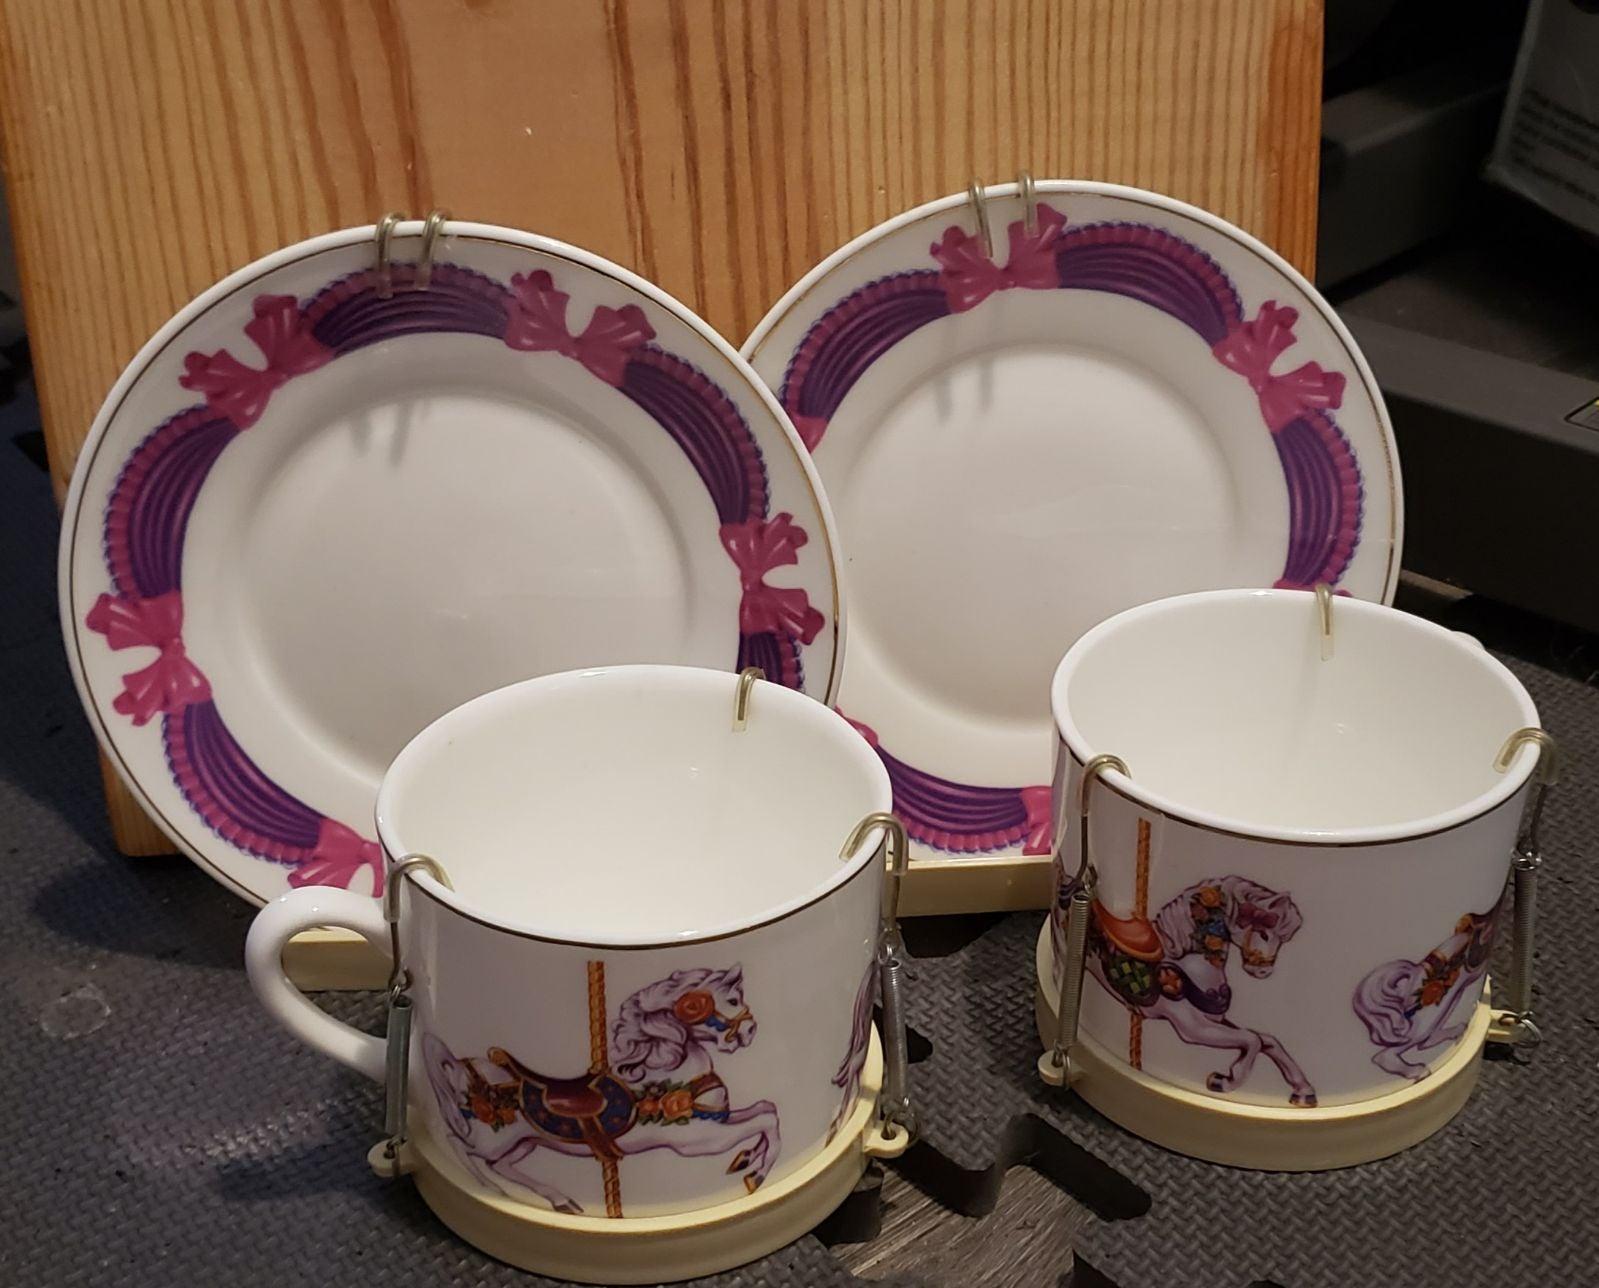 Vintage Carousel horse tea set